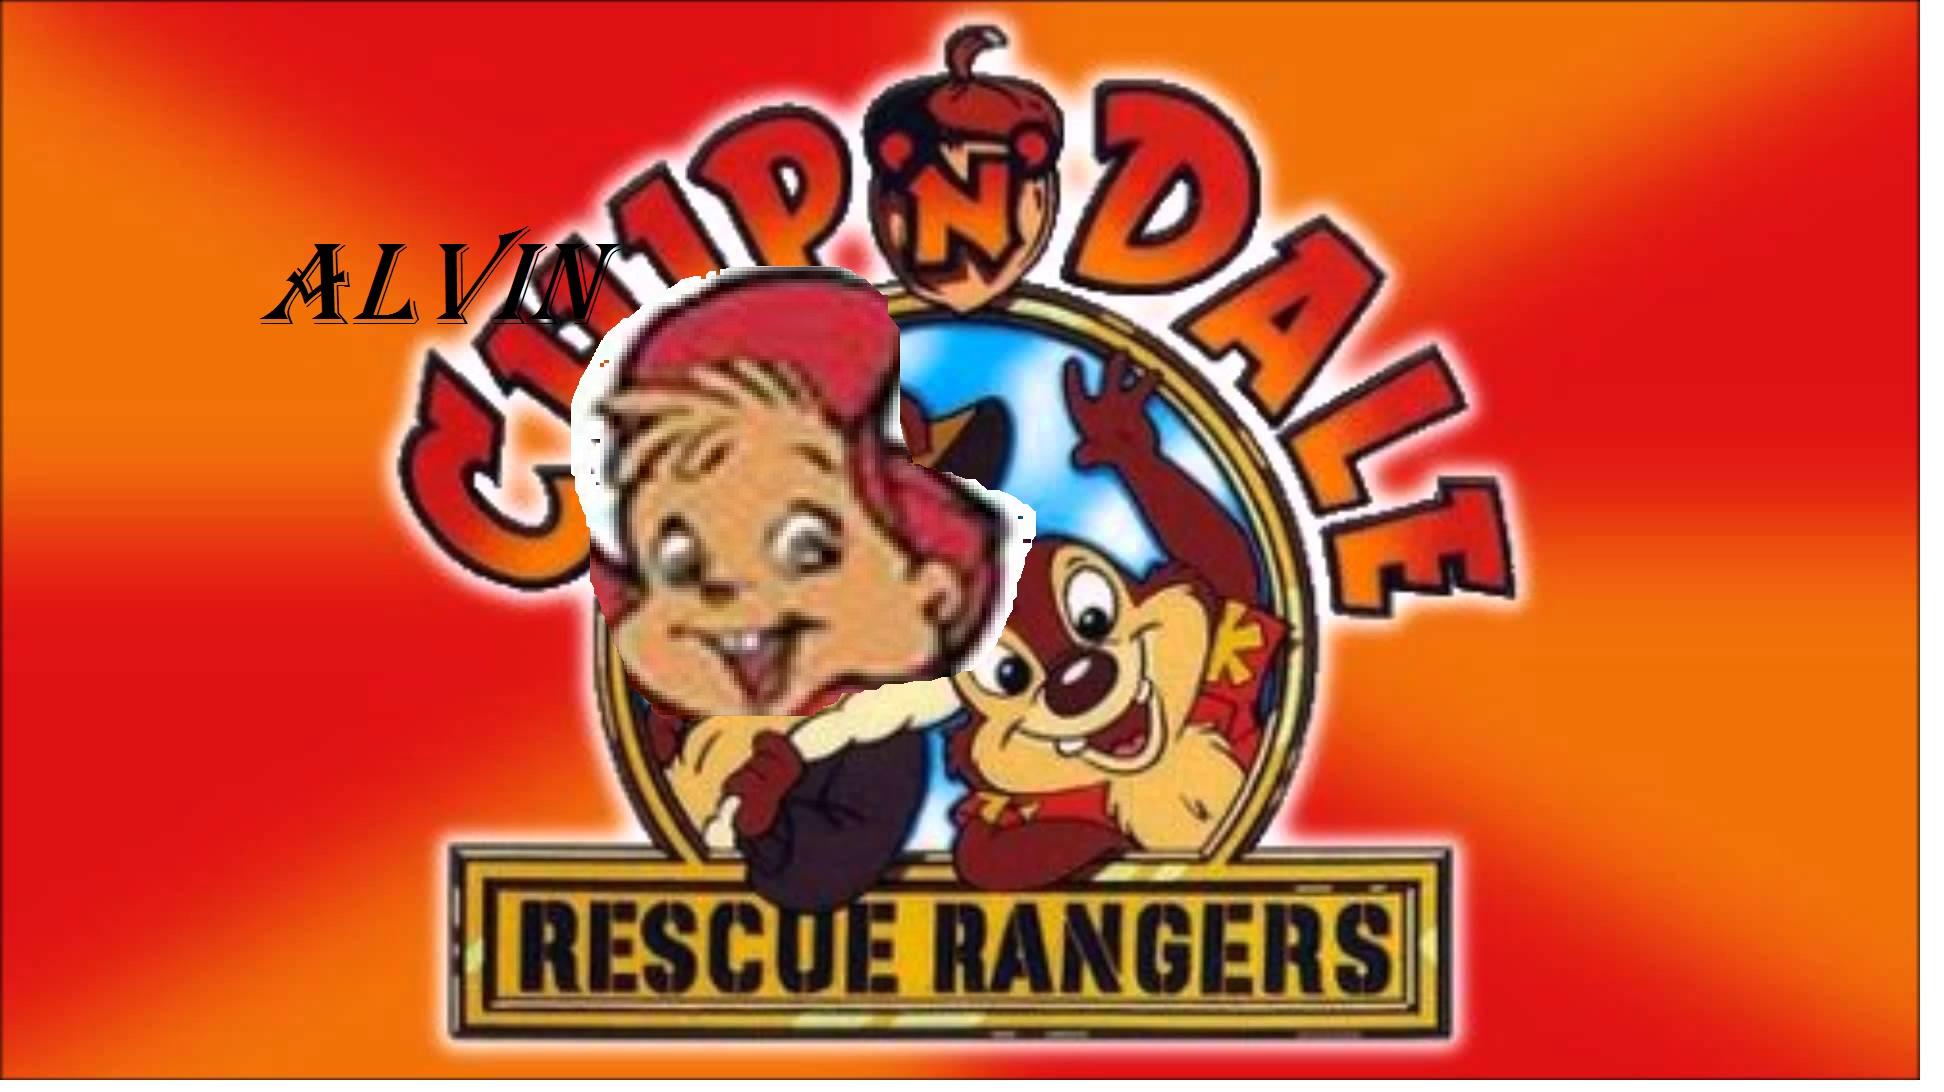 Alvin 'n Dale Rescue Rangers